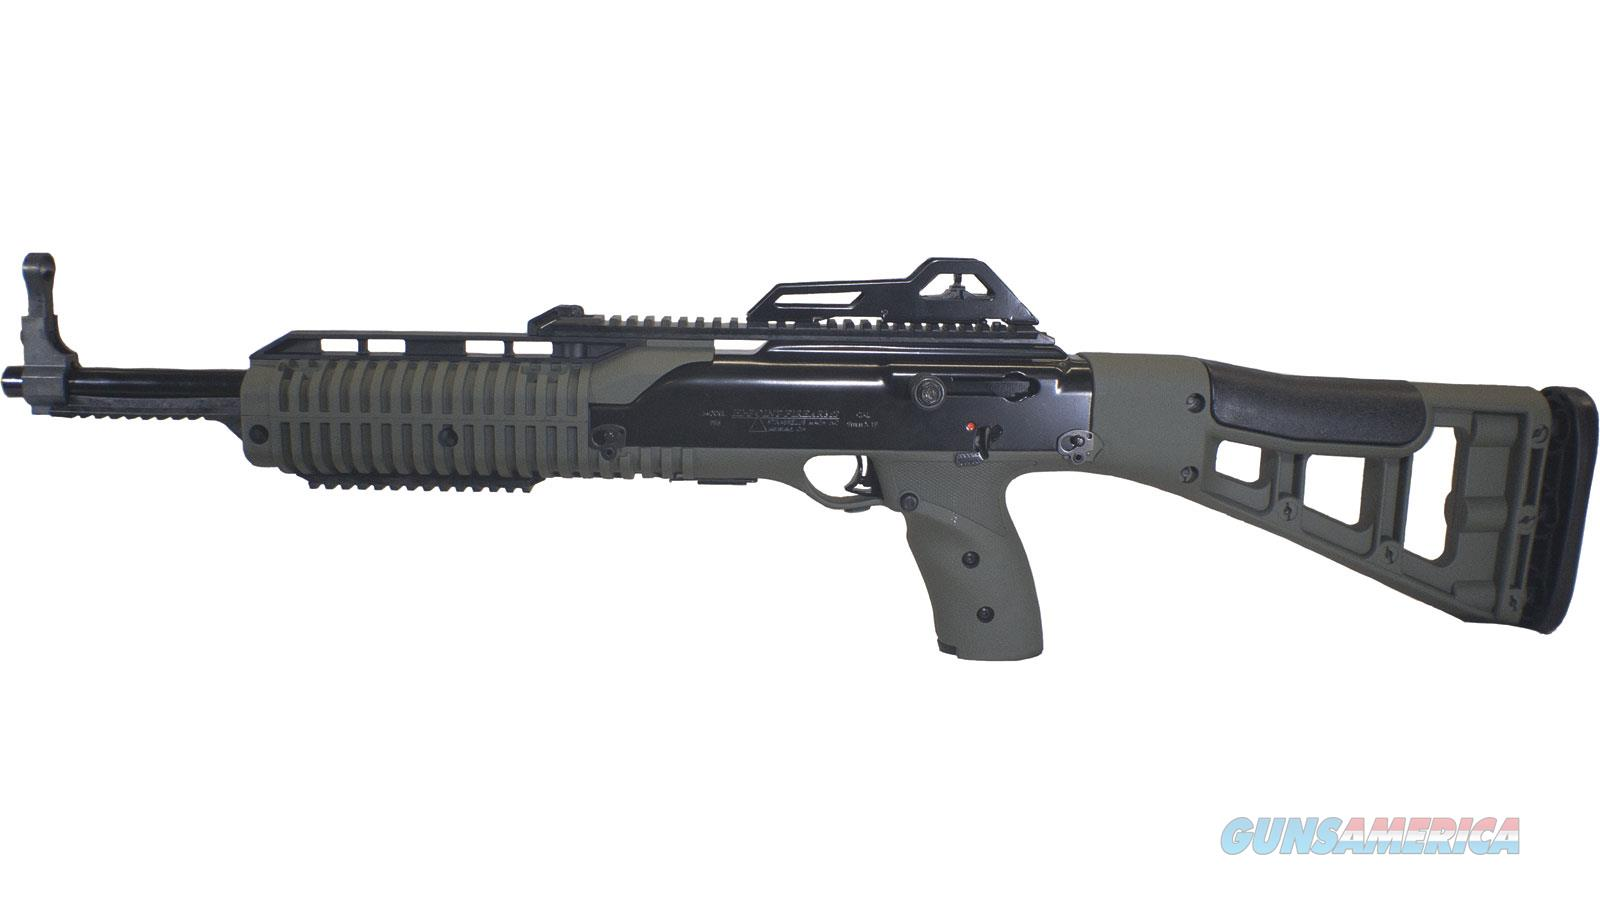 "Hipoint 45Ts Carb 45Acp 17.5"" 9Rd 4595TSOD  Guns > Rifles > H Misc Rifles"